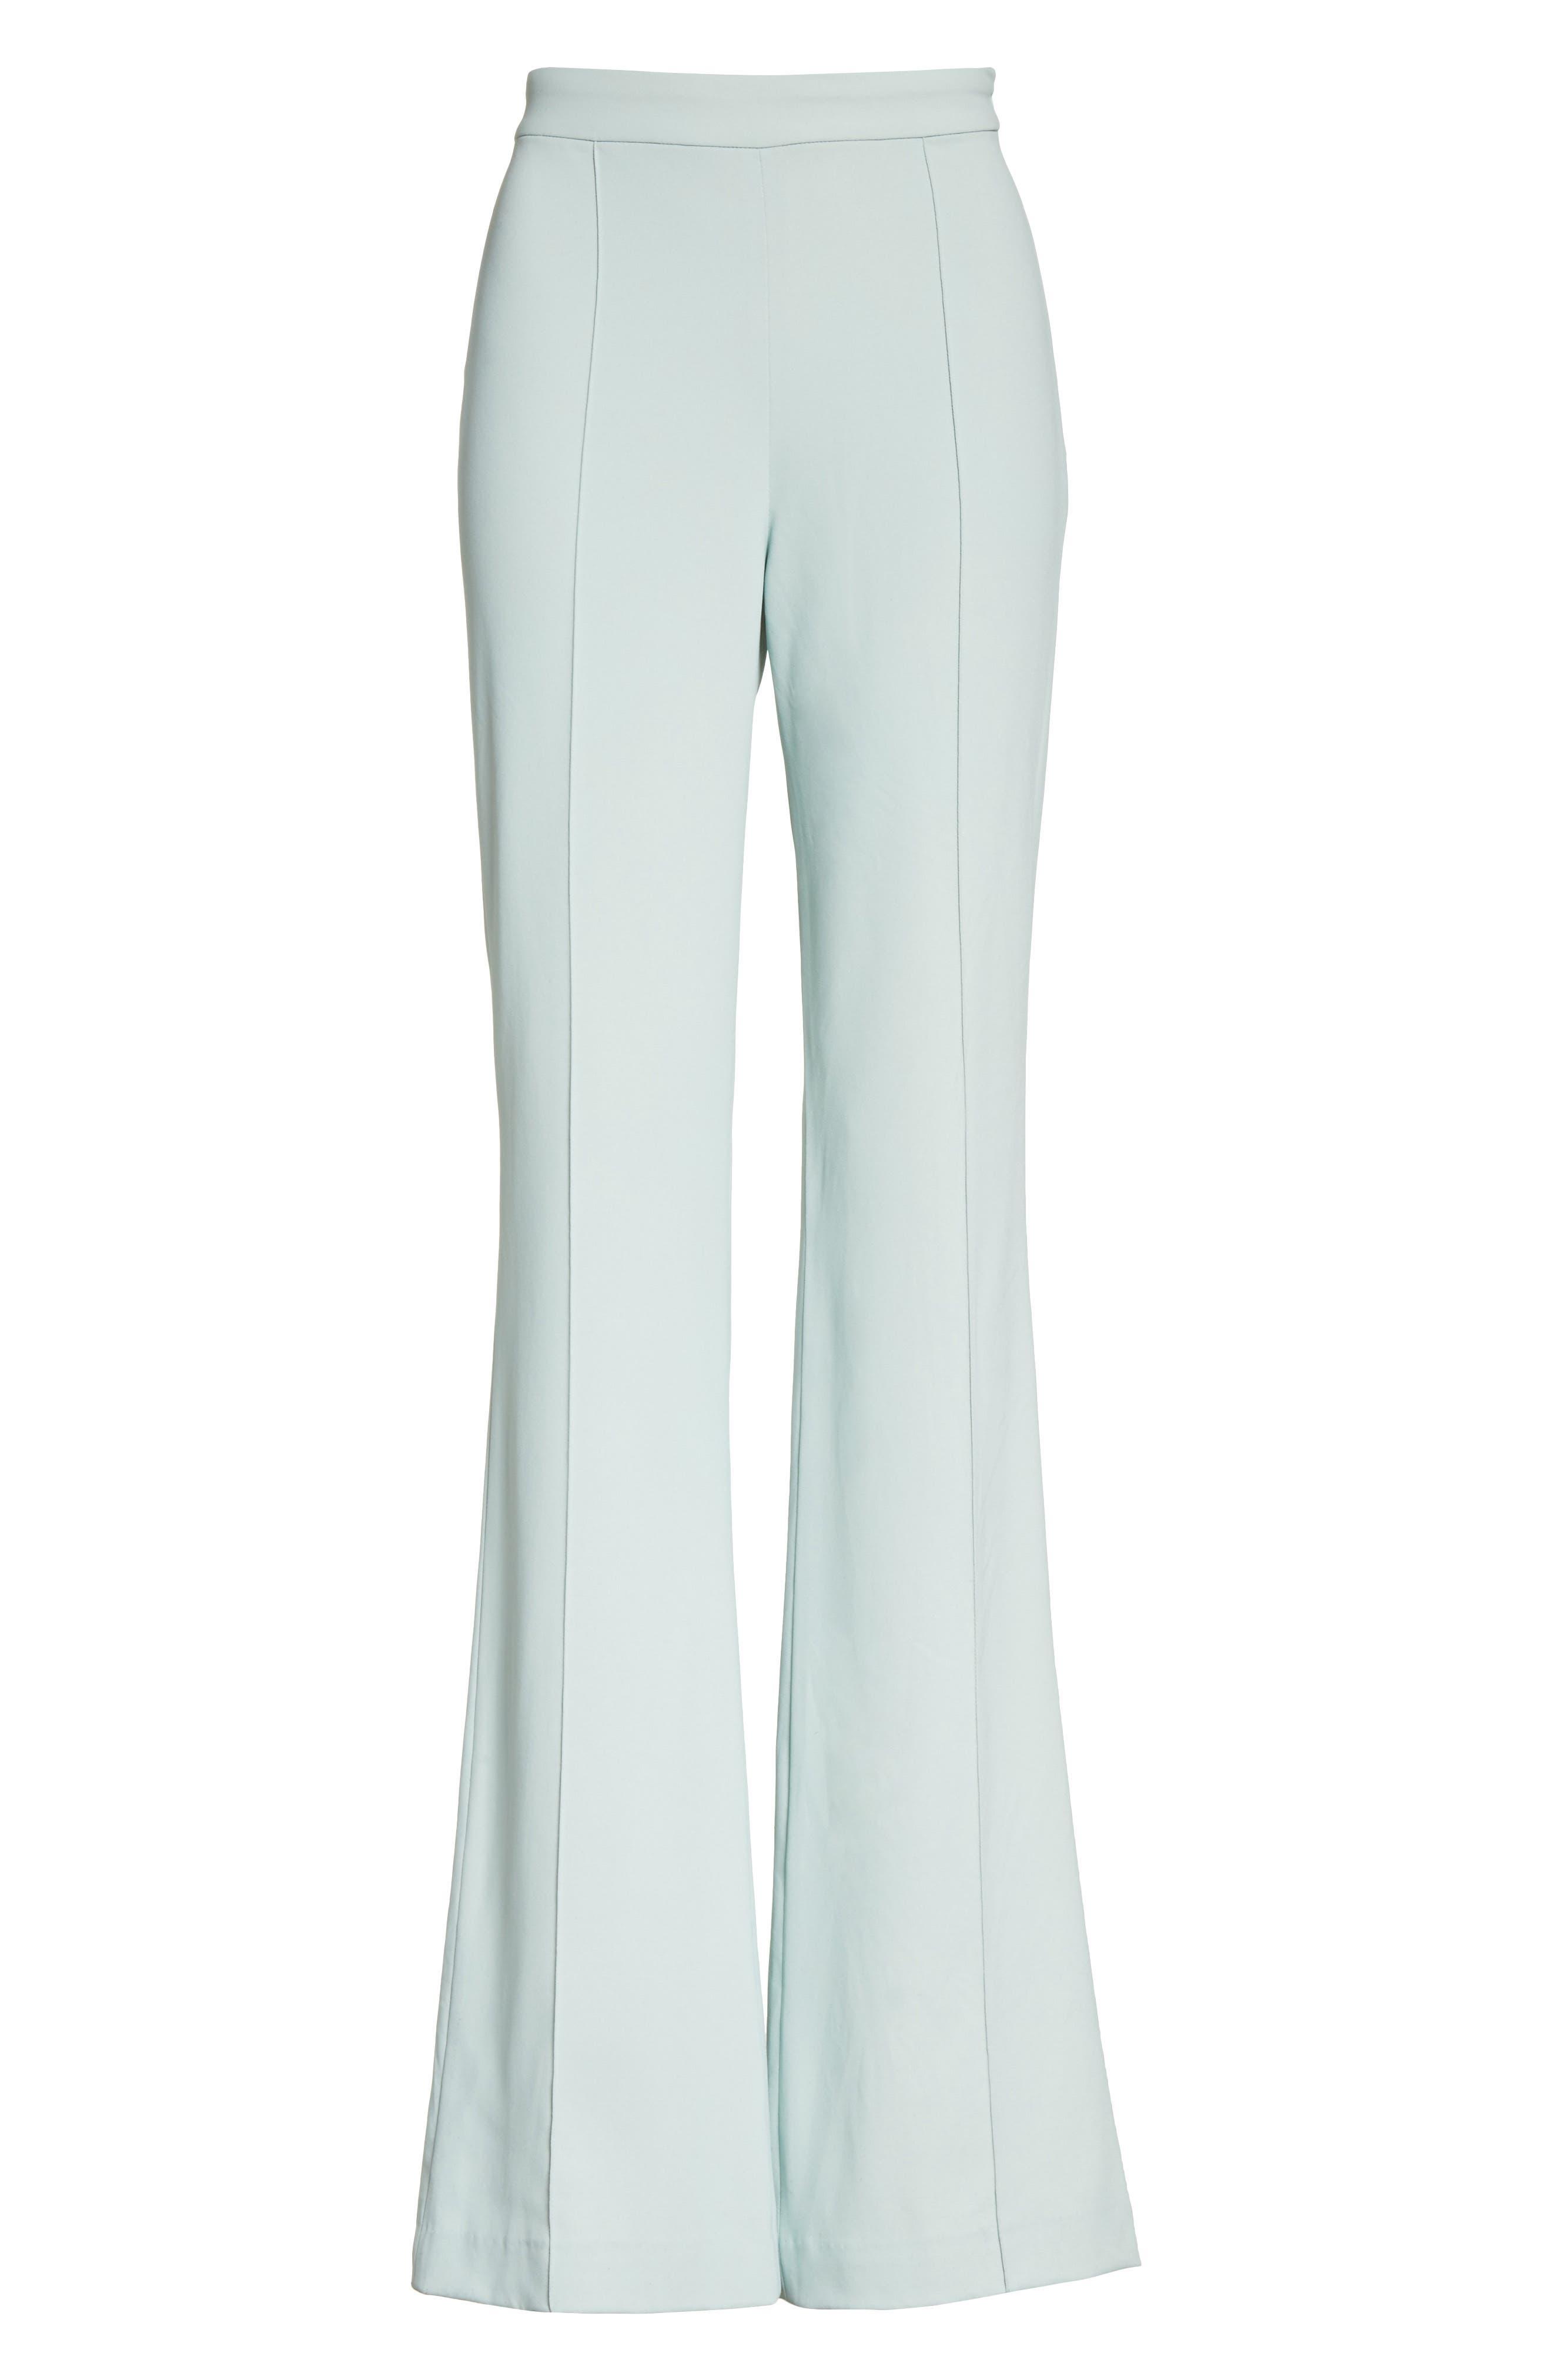 Jalisa High Waist Flared Leg Pants,                             Alternate thumbnail 6, color,                             404